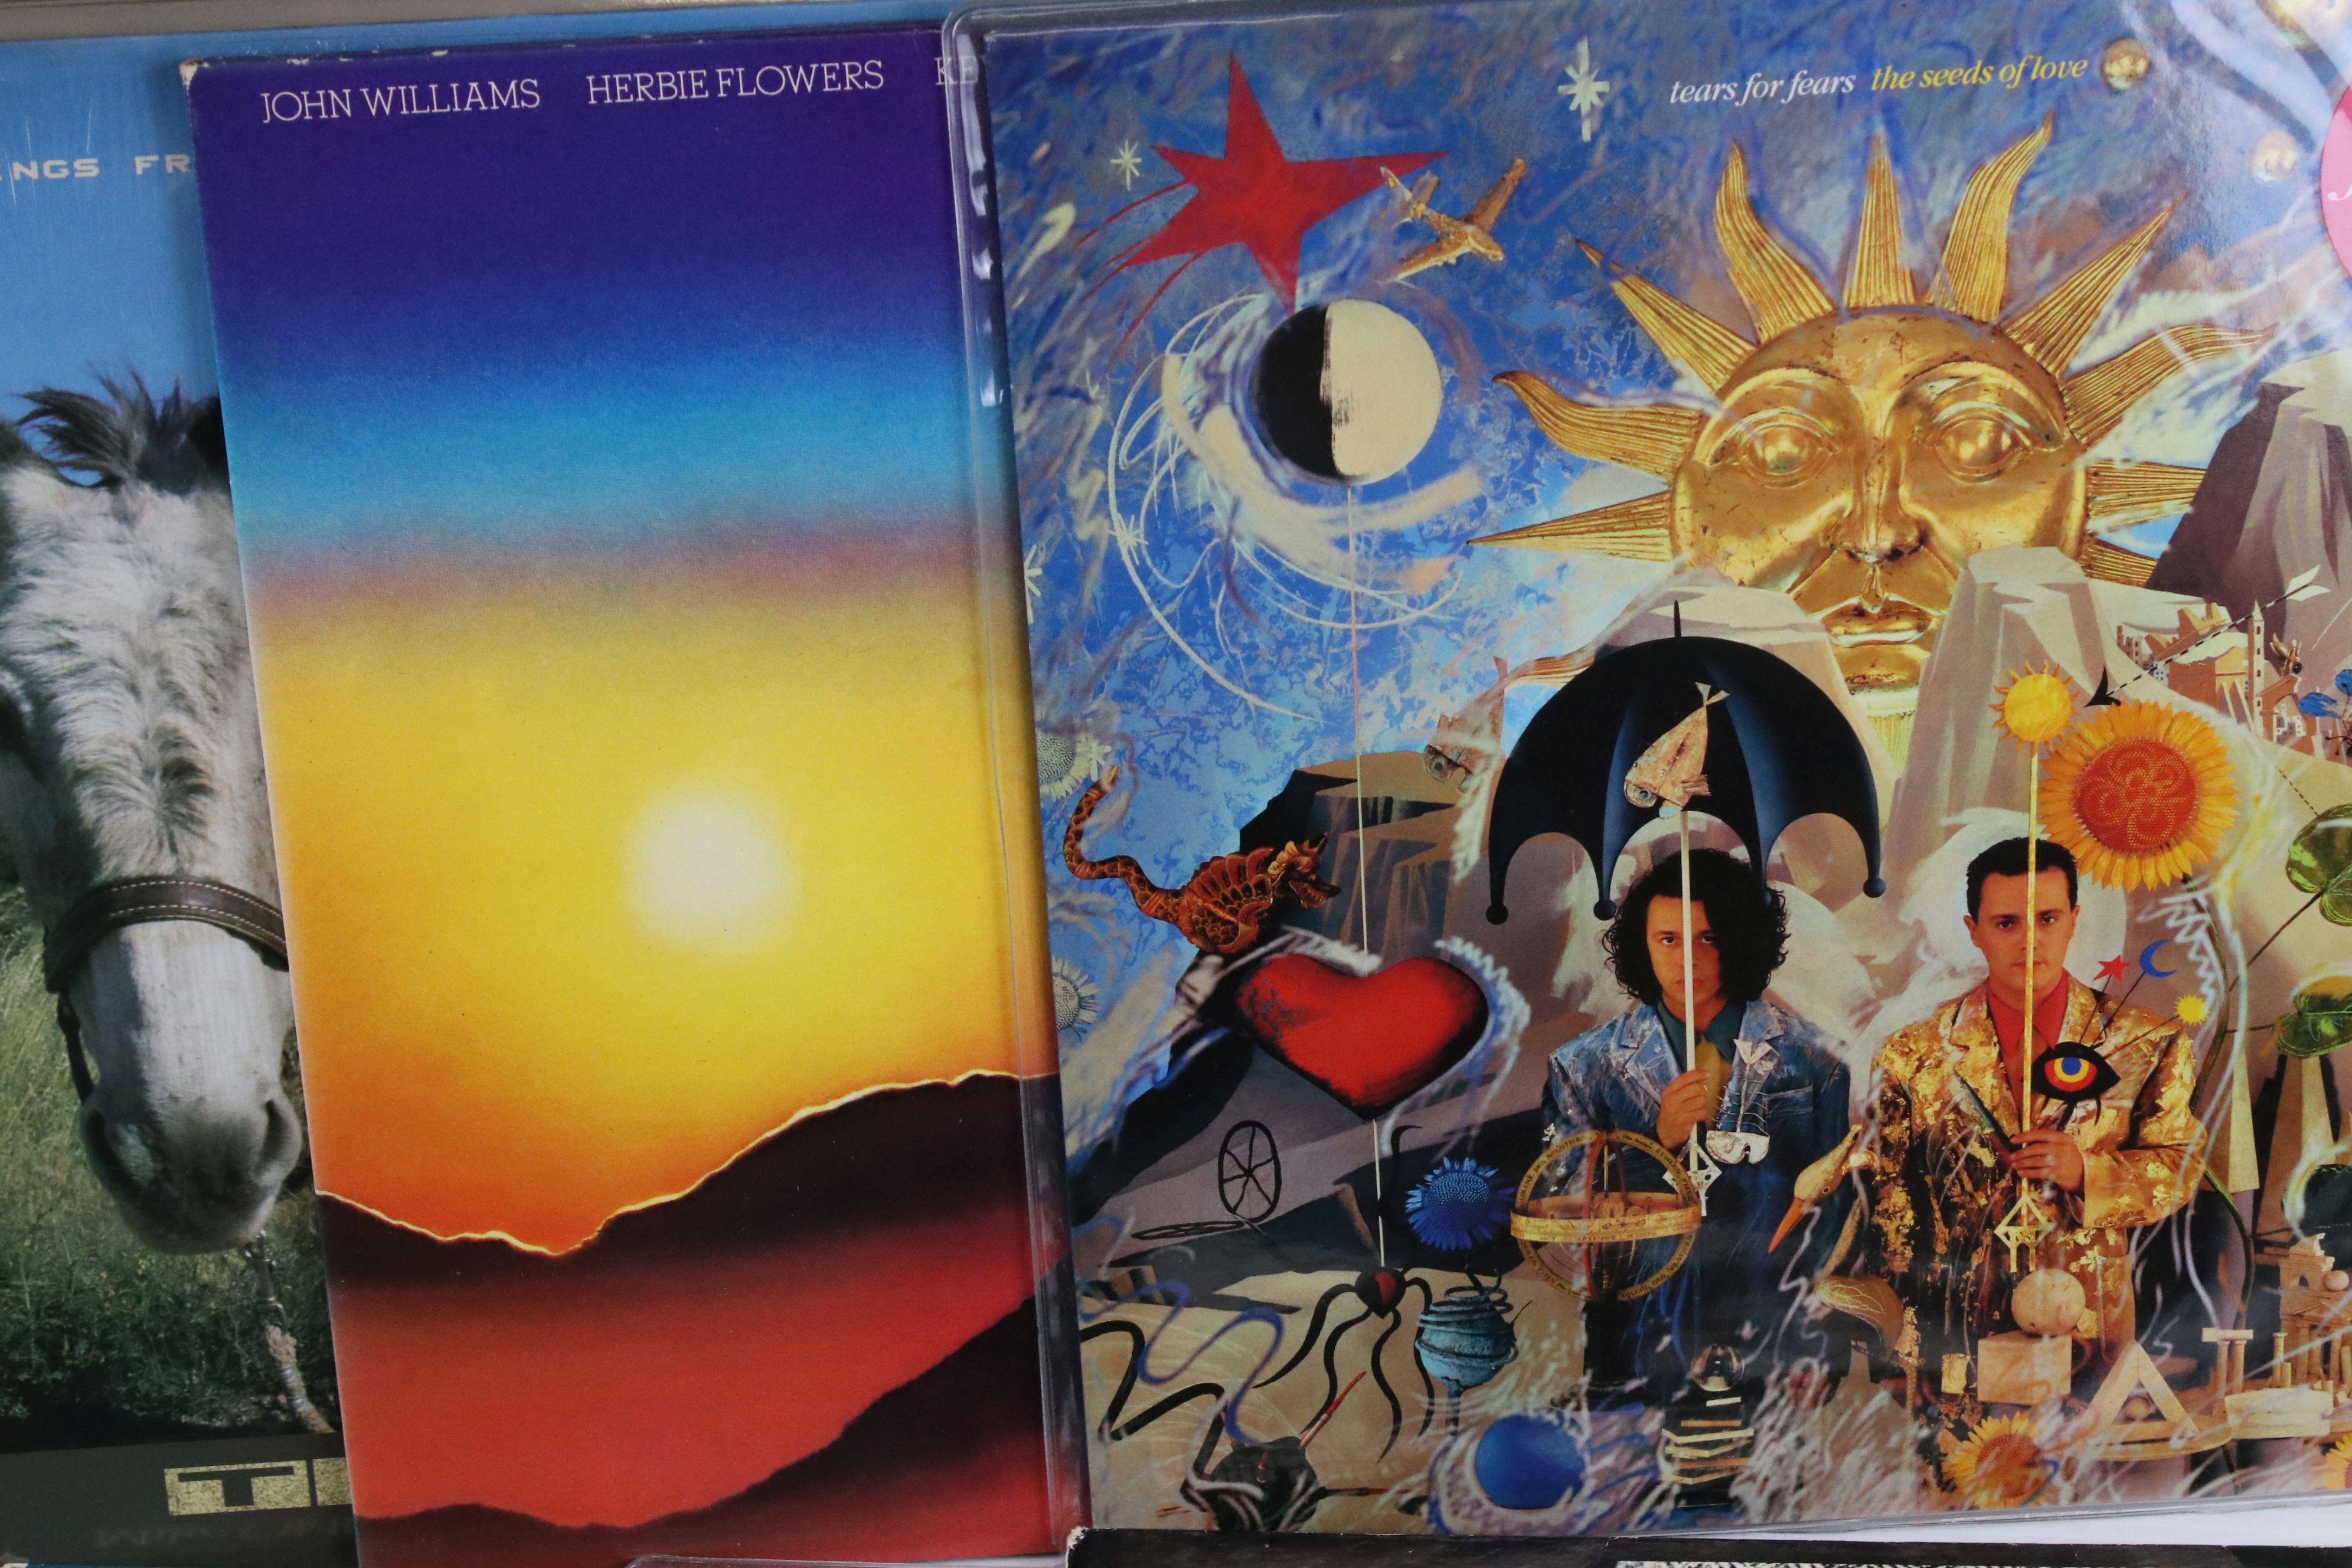 Vinyl - Approx 150 Rock & Pop LP's including Elton John, Fine Young Cannibals, Roxy Music, Sad Cafe, - Image 2 of 5